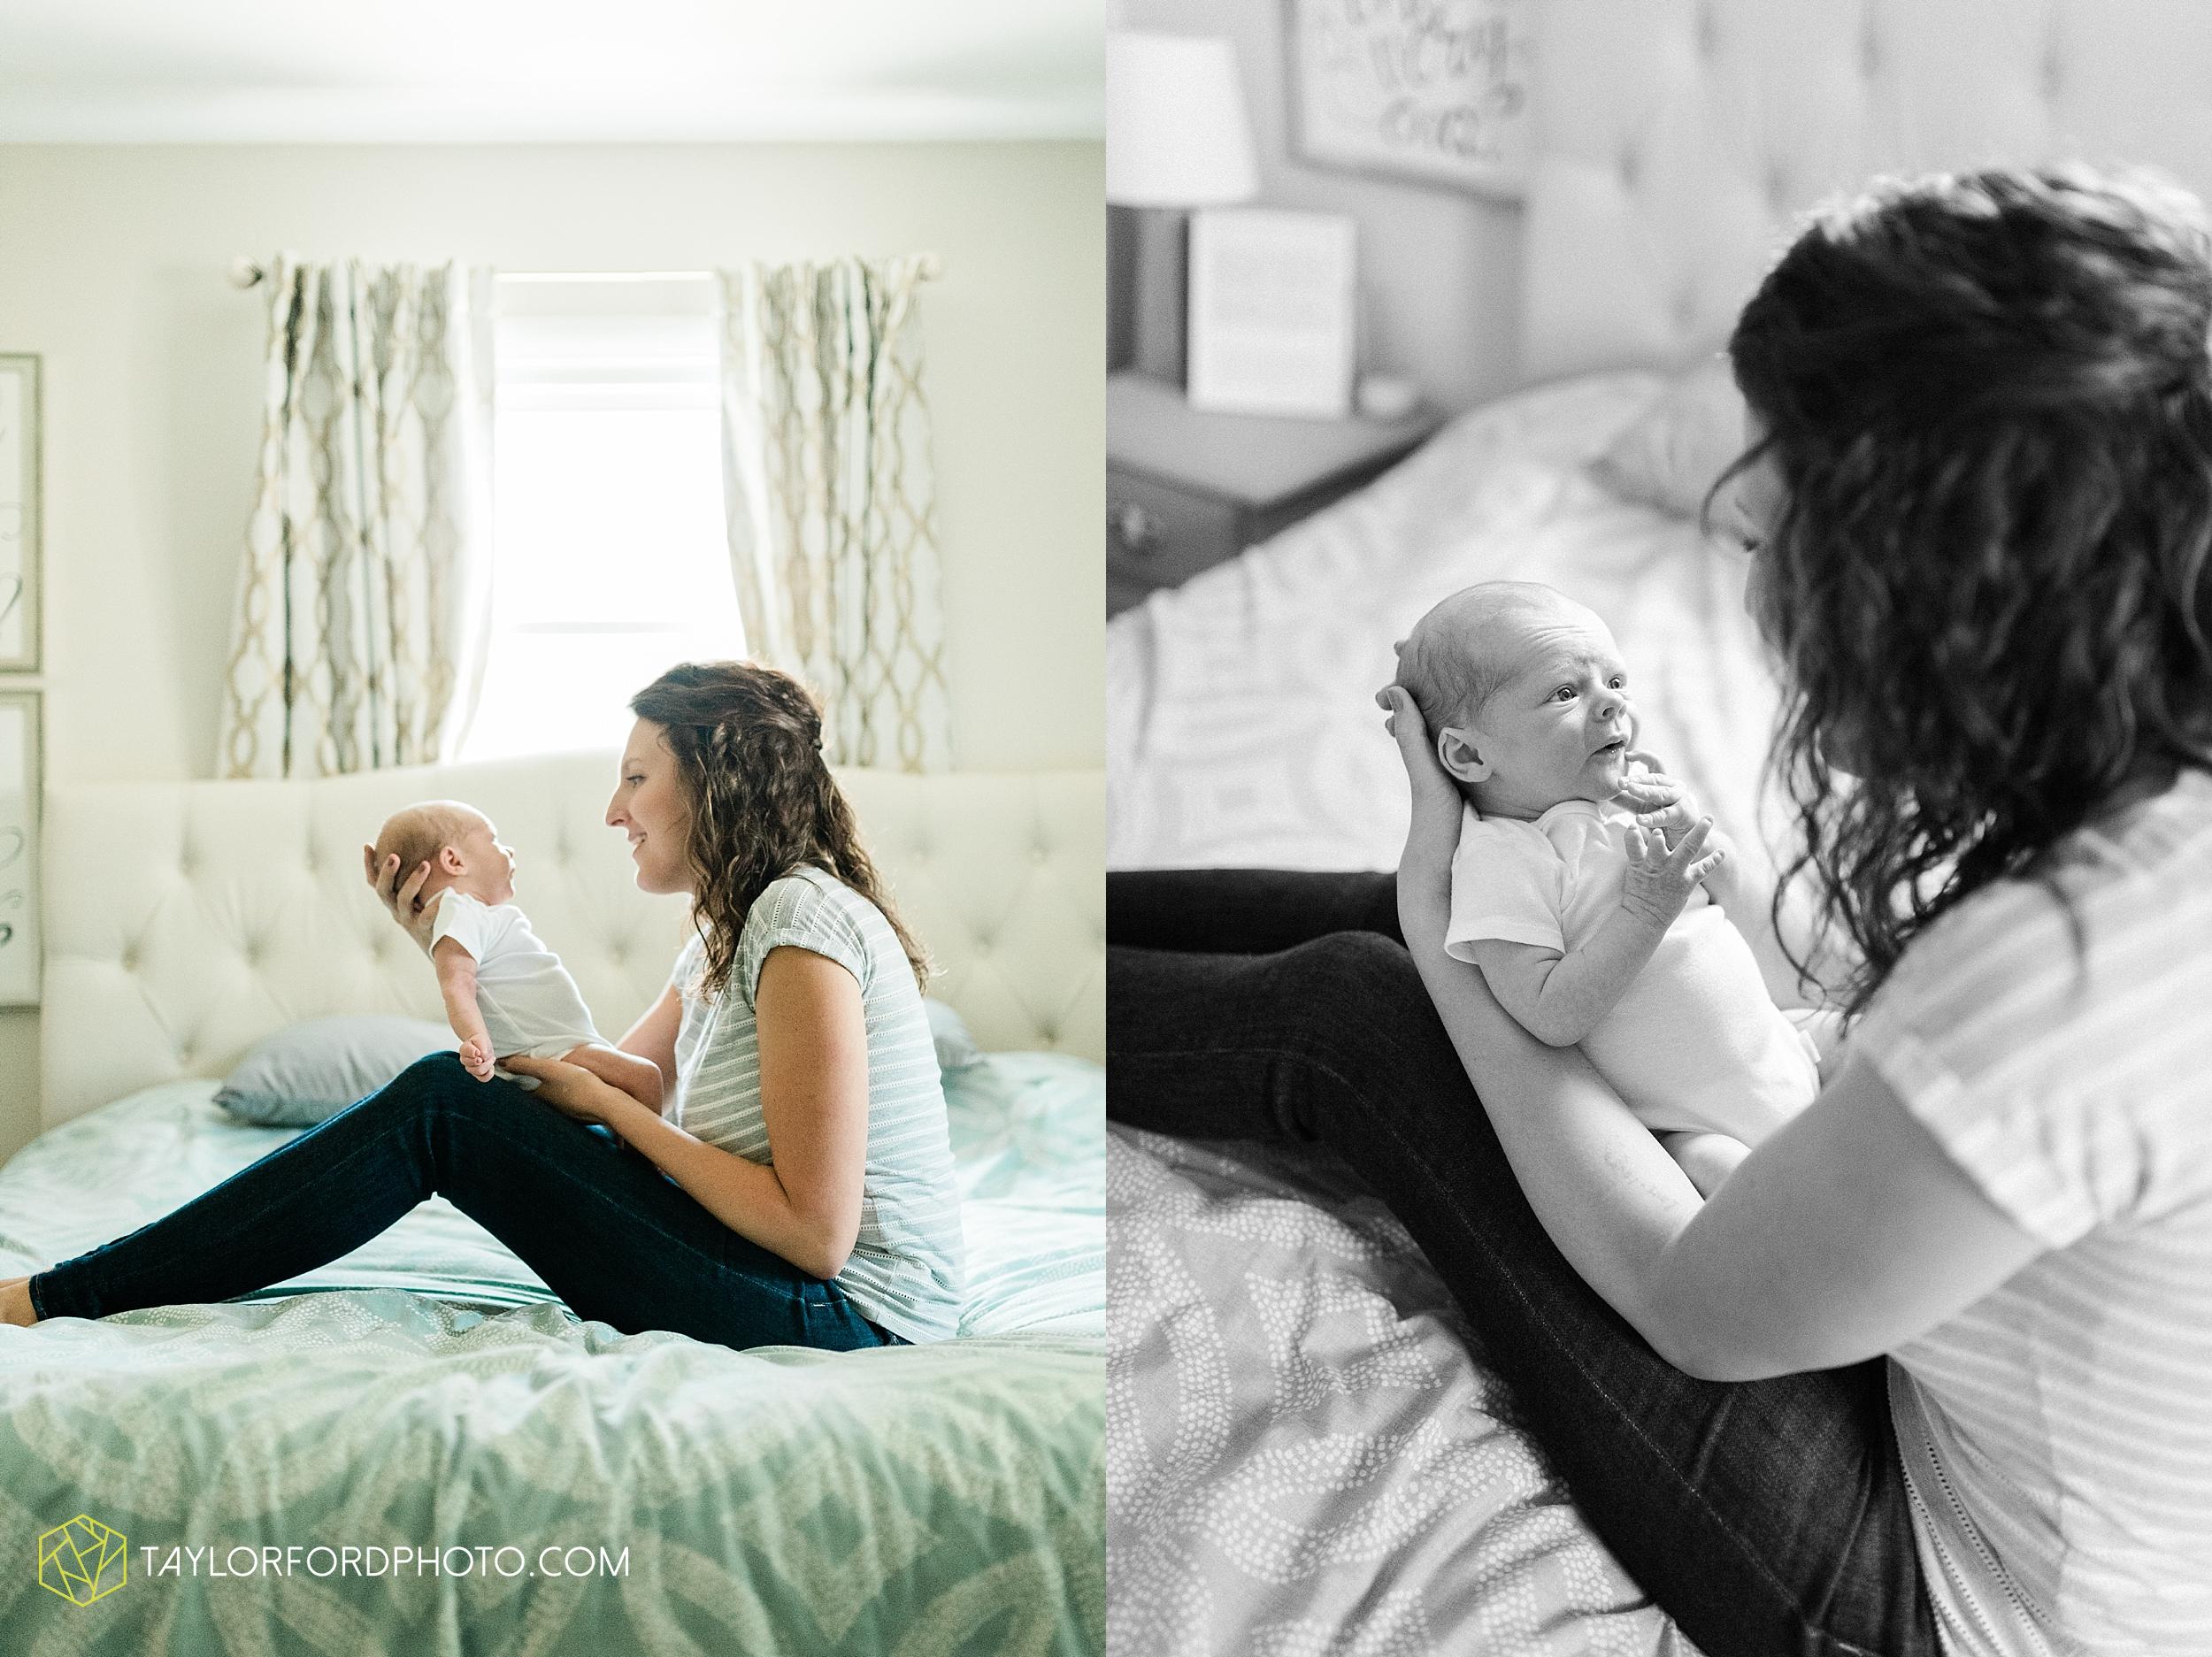 indoor-at-home-nursery-marshall-michigan-family-newborn-photographer-taylor-ford-photography_9971.jpg